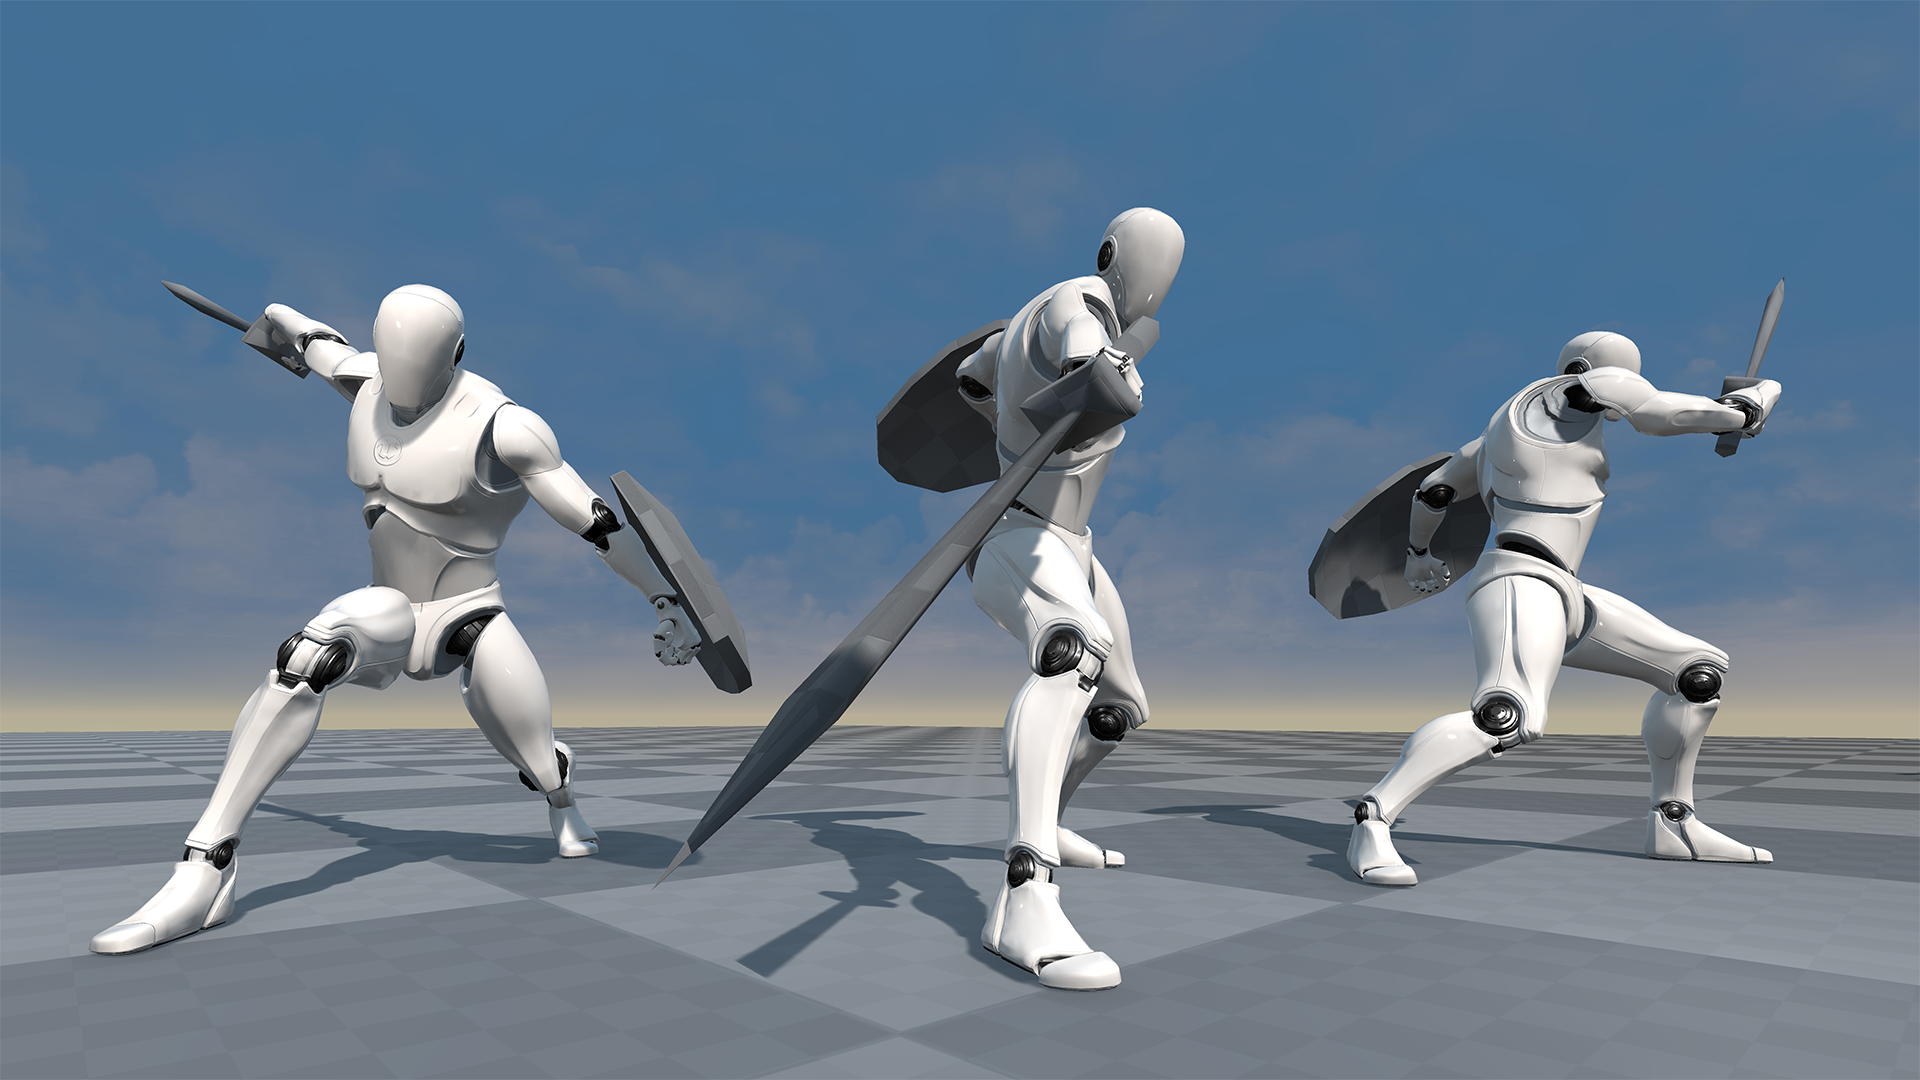 Dynamic Sword Animset by Blueisland A in Animations - UE4